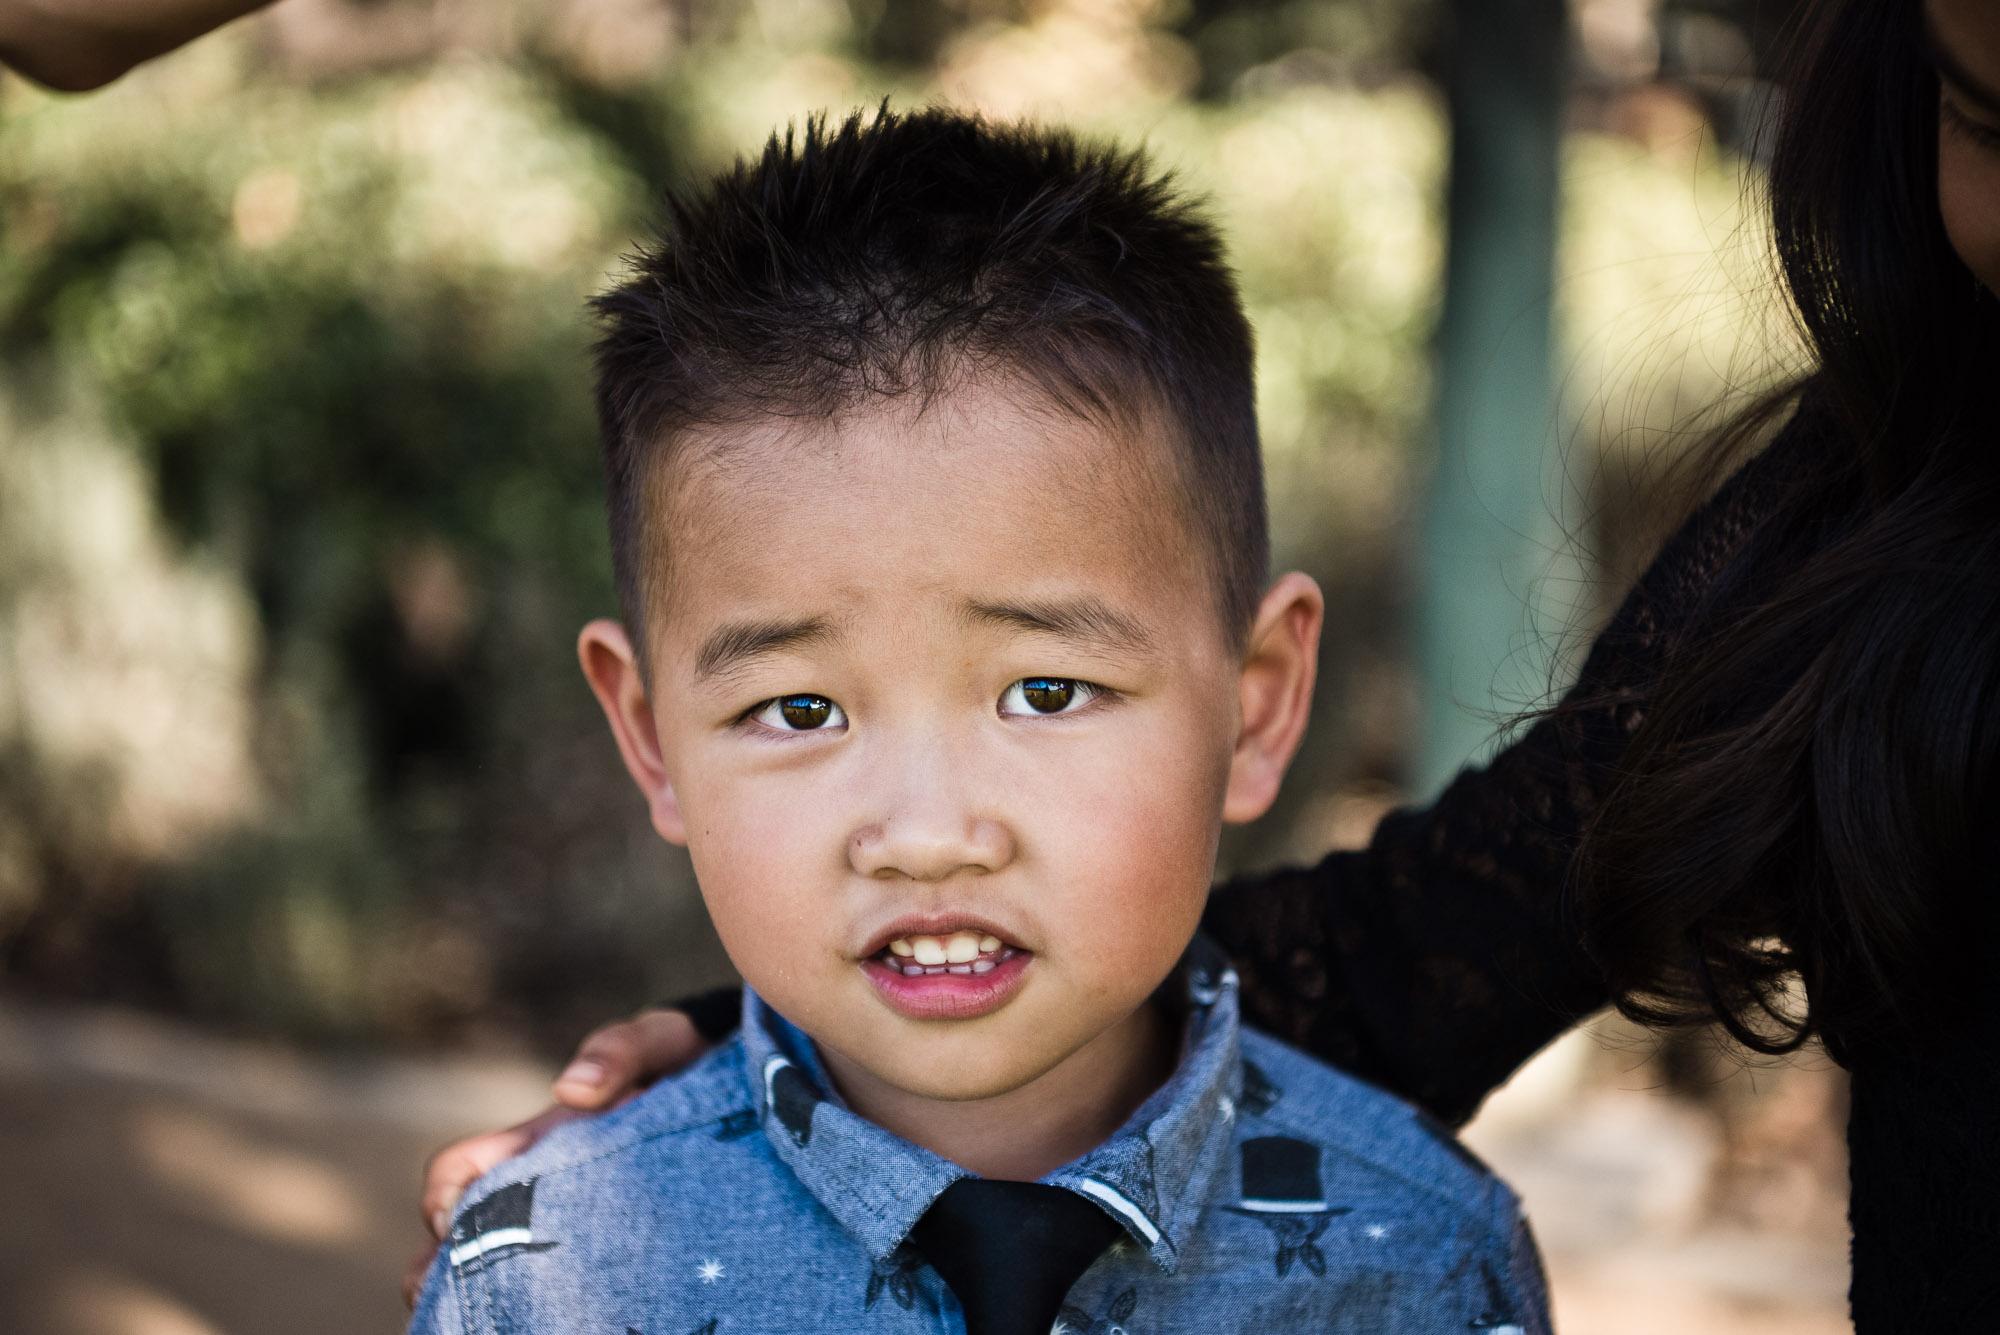 Little boy in Cedar Grove Park in Tustin, California. Full post at lisahuchen.com.